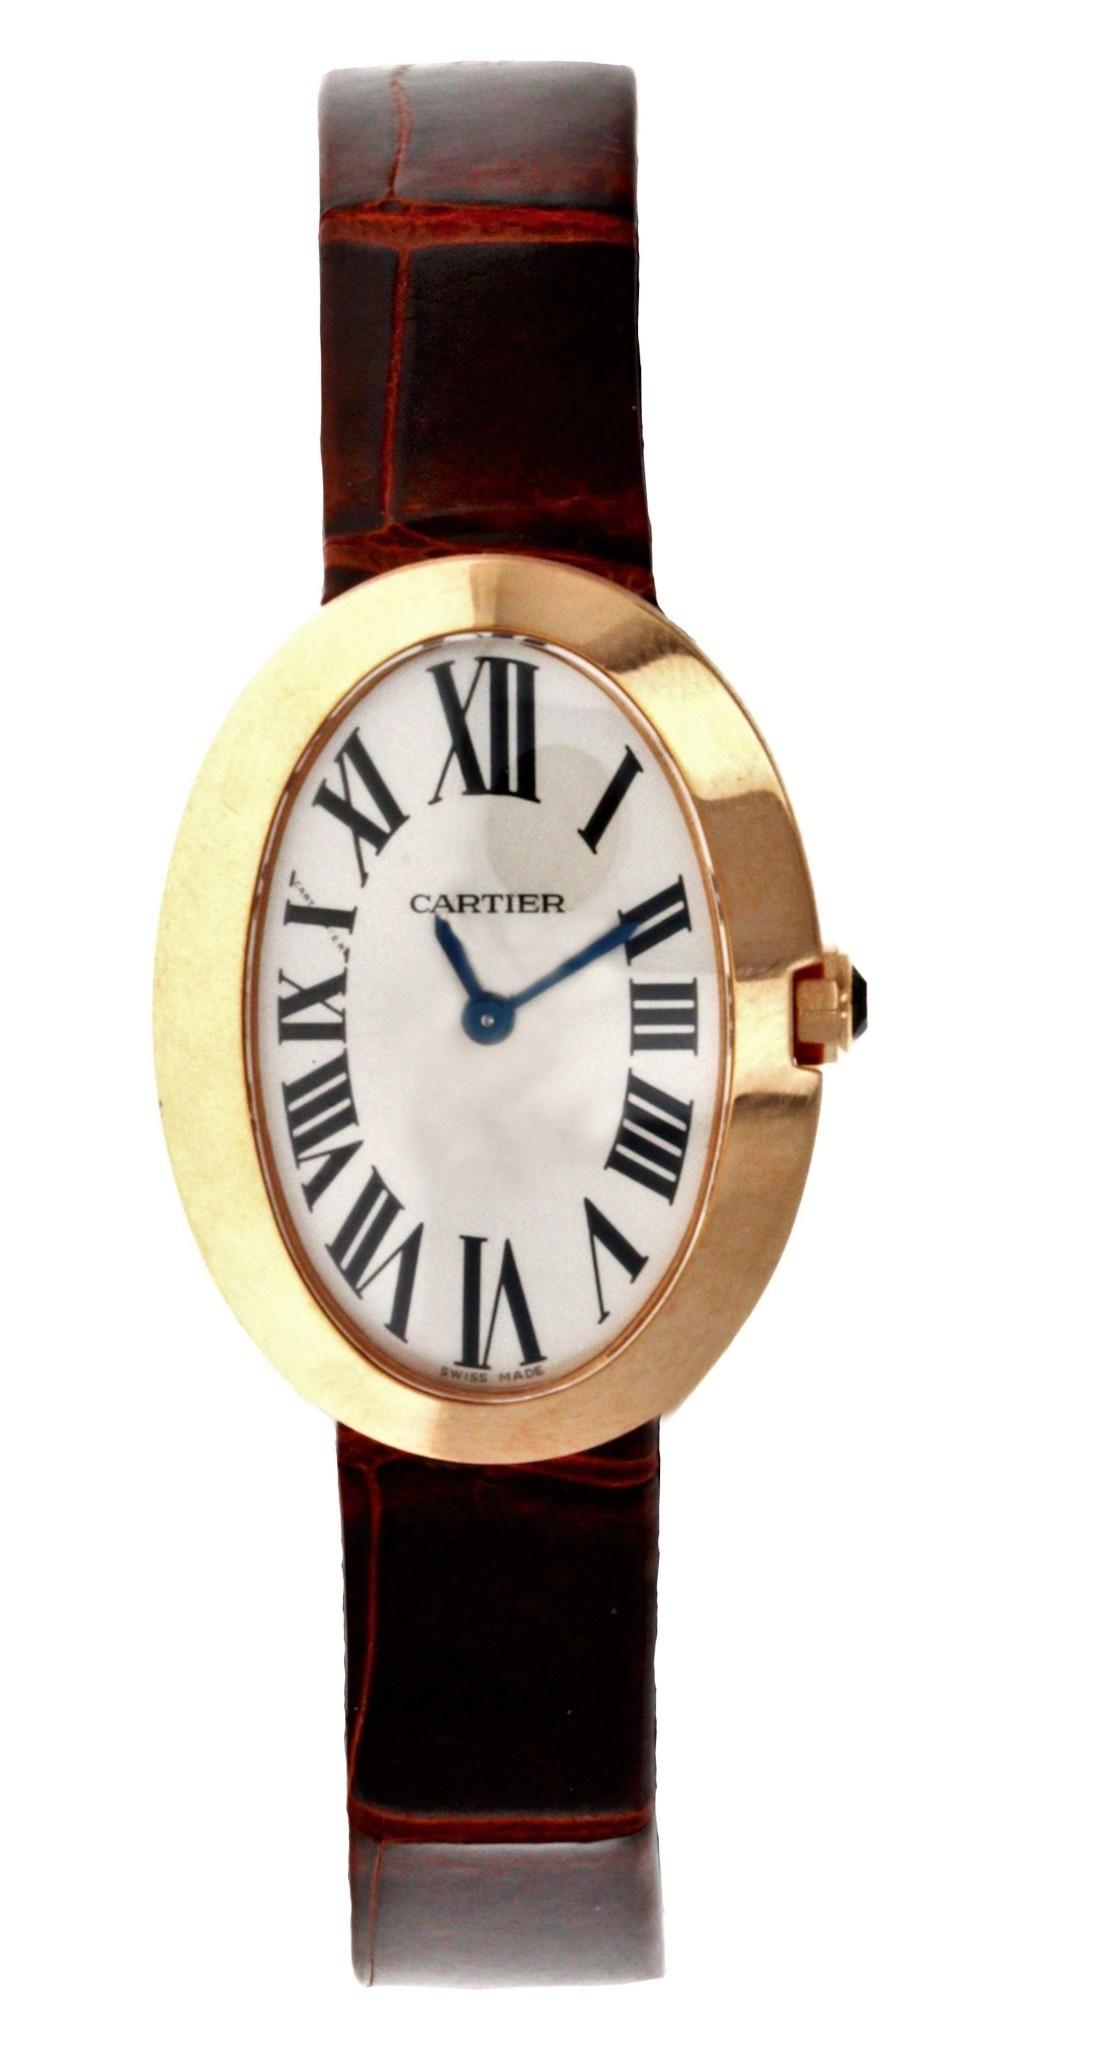 Ladies Watch Suggested By Watchfinder